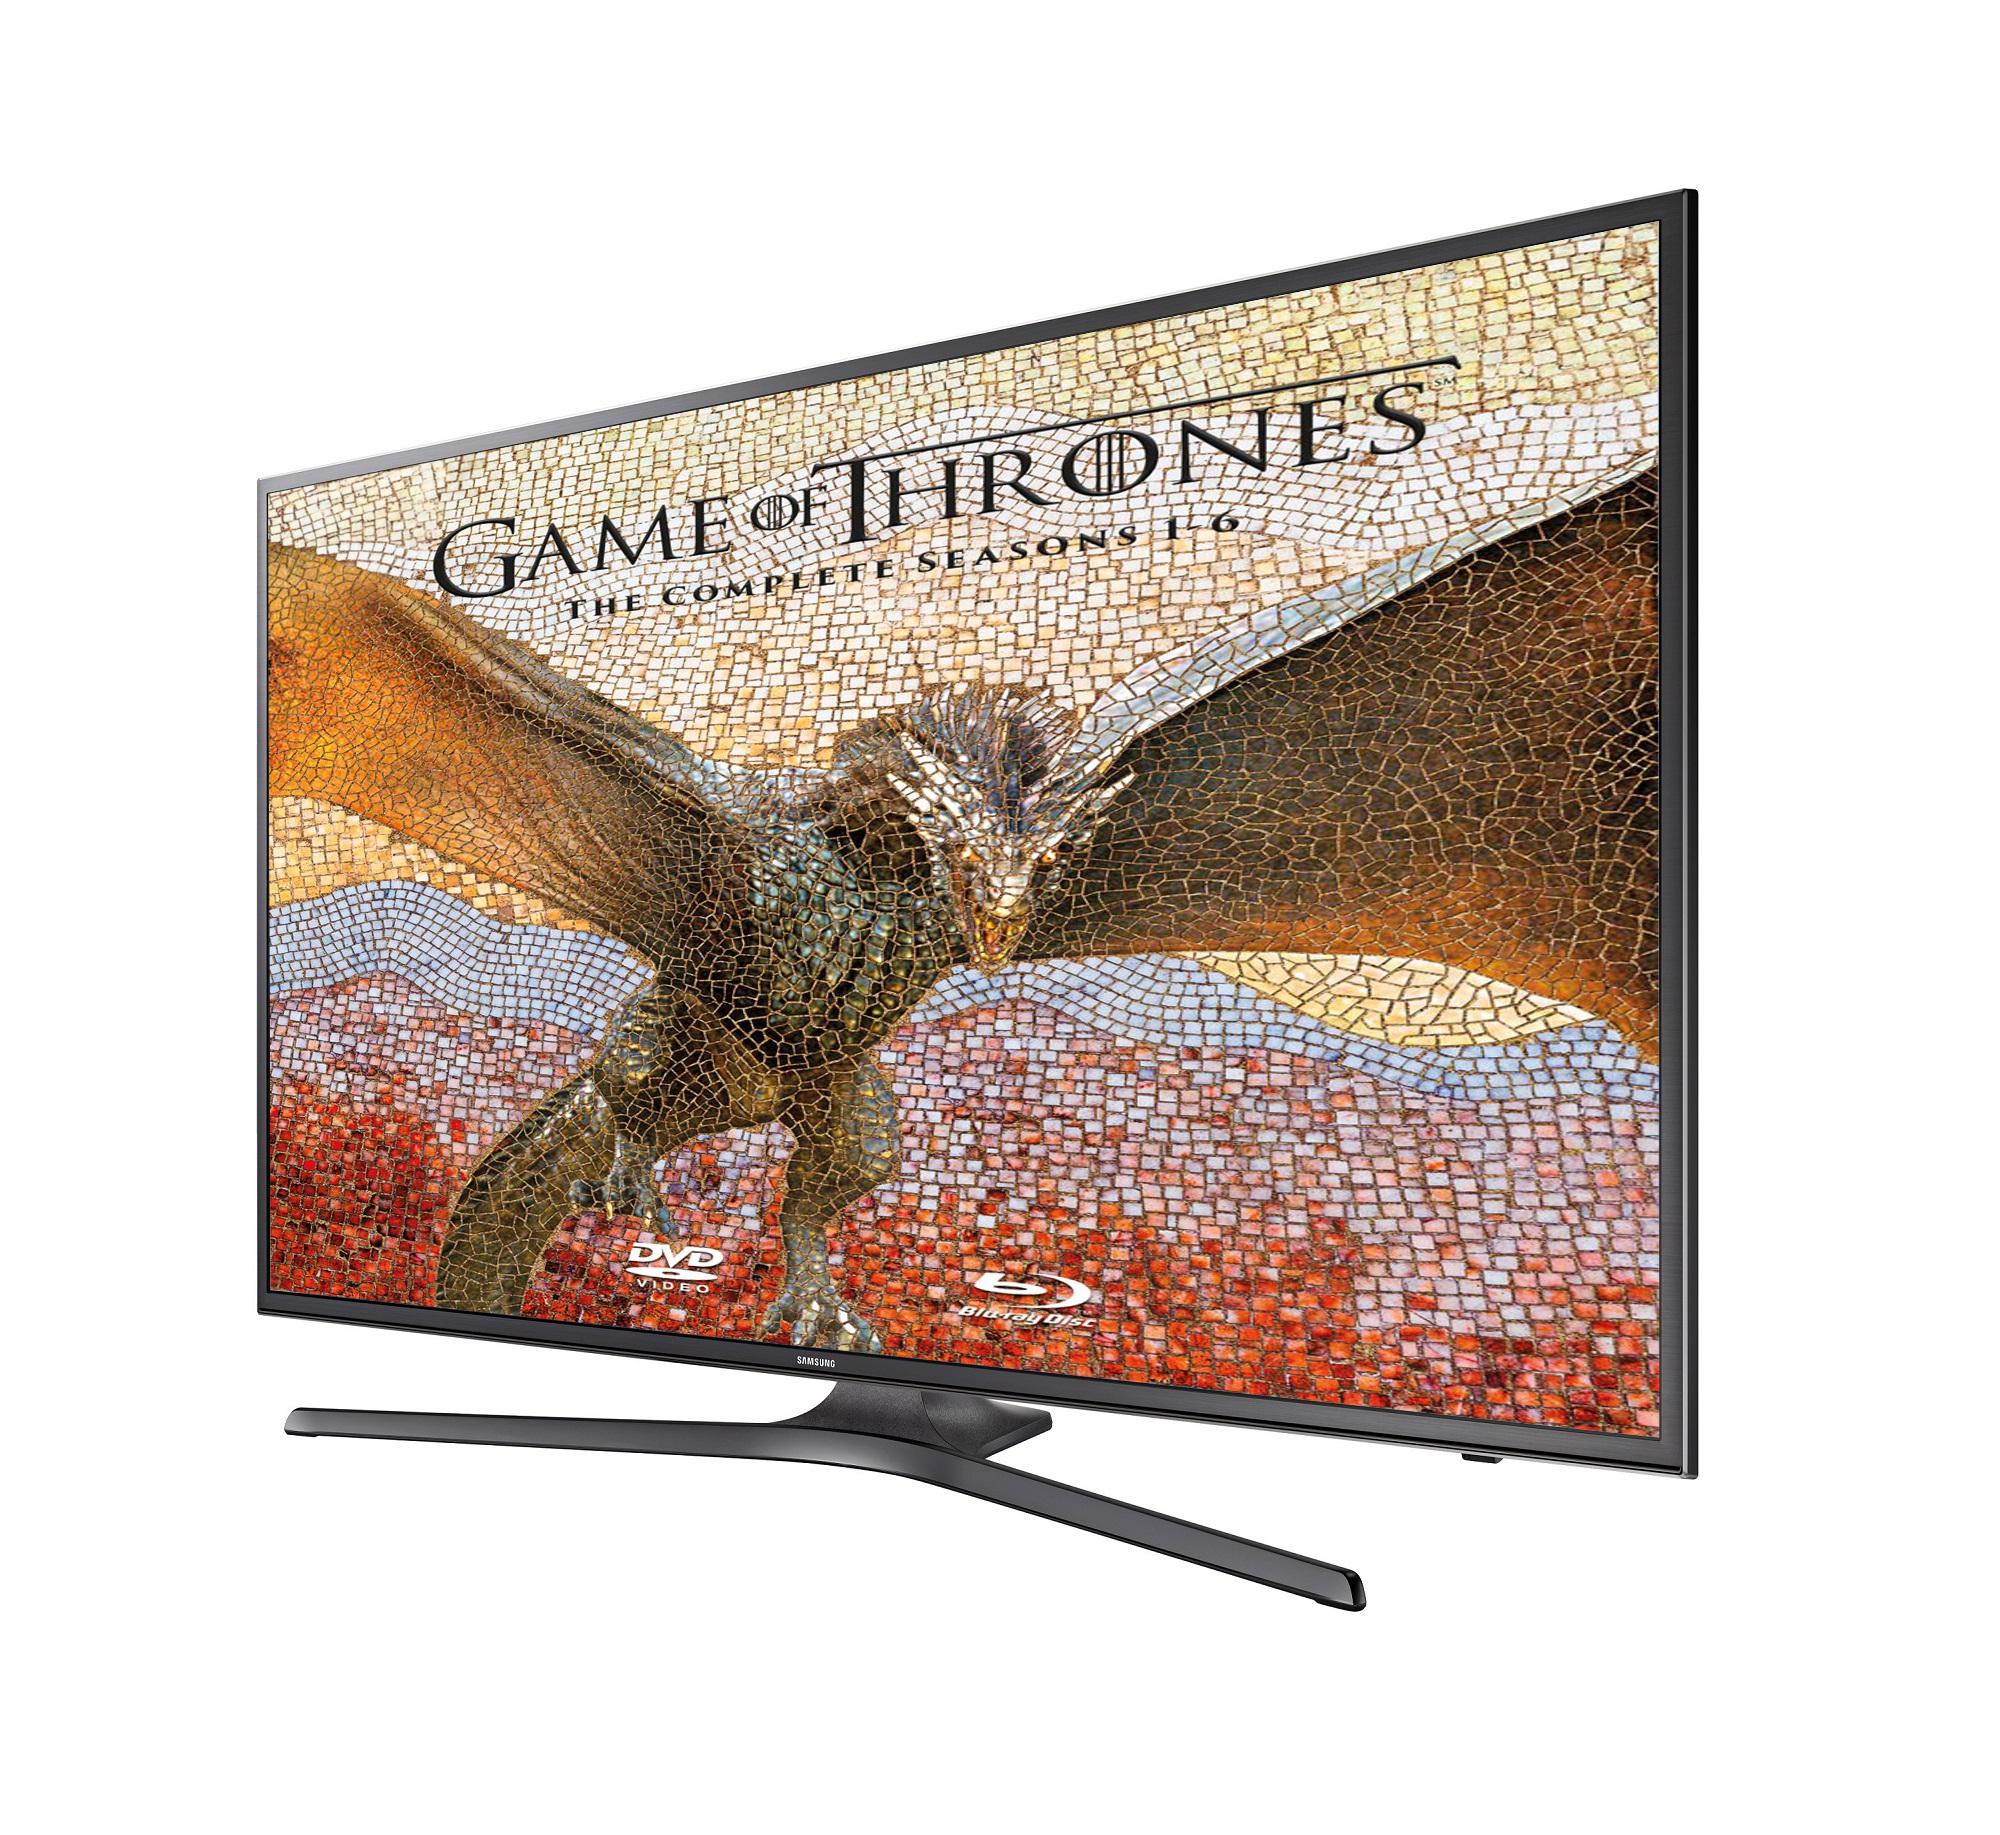 Best Buy: pantalla Samsung UN65KU6300